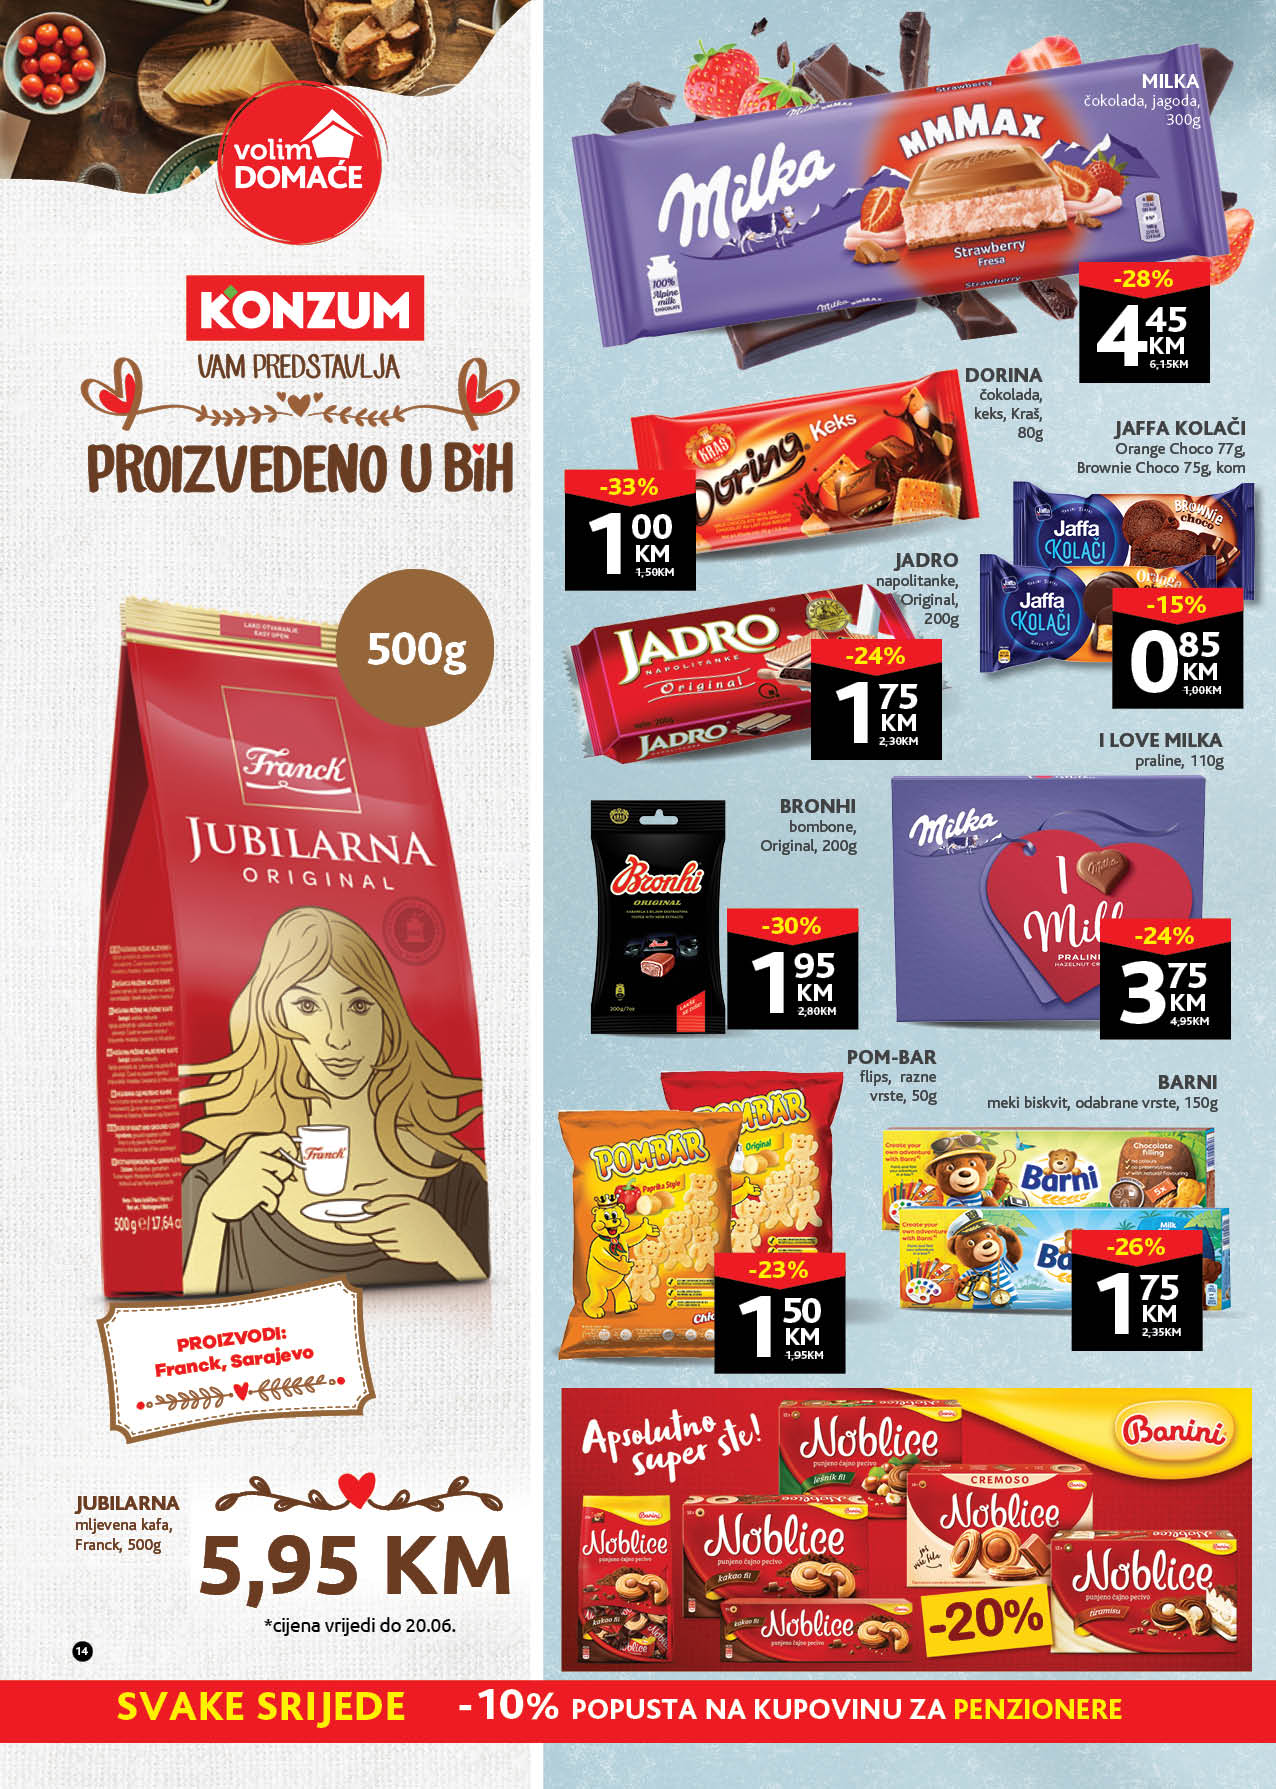 KONZUM Katalog Redovni katalog JUN 2021 07.06. 17.06. eKatalozi.com PR Page 14